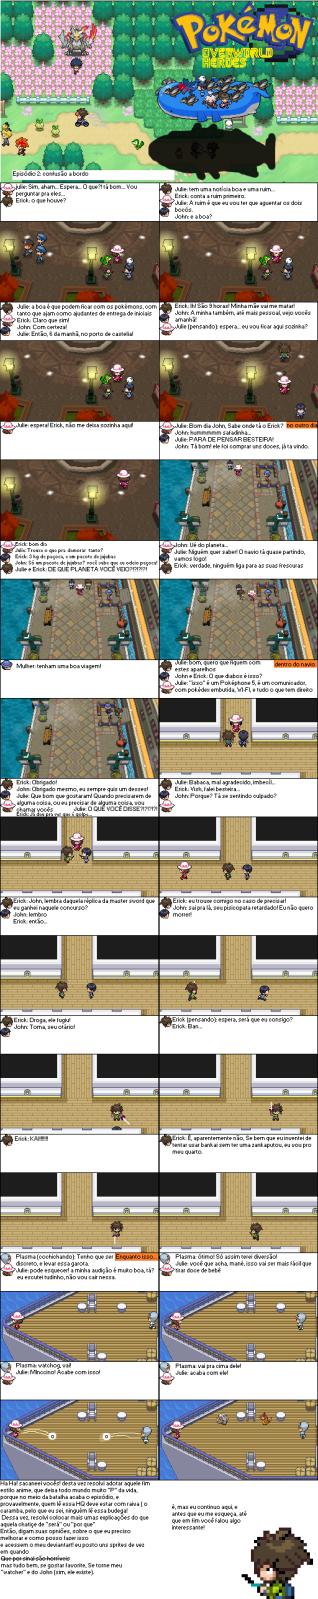 Pokémon Overworld Heroes [+72] Xnu5b7